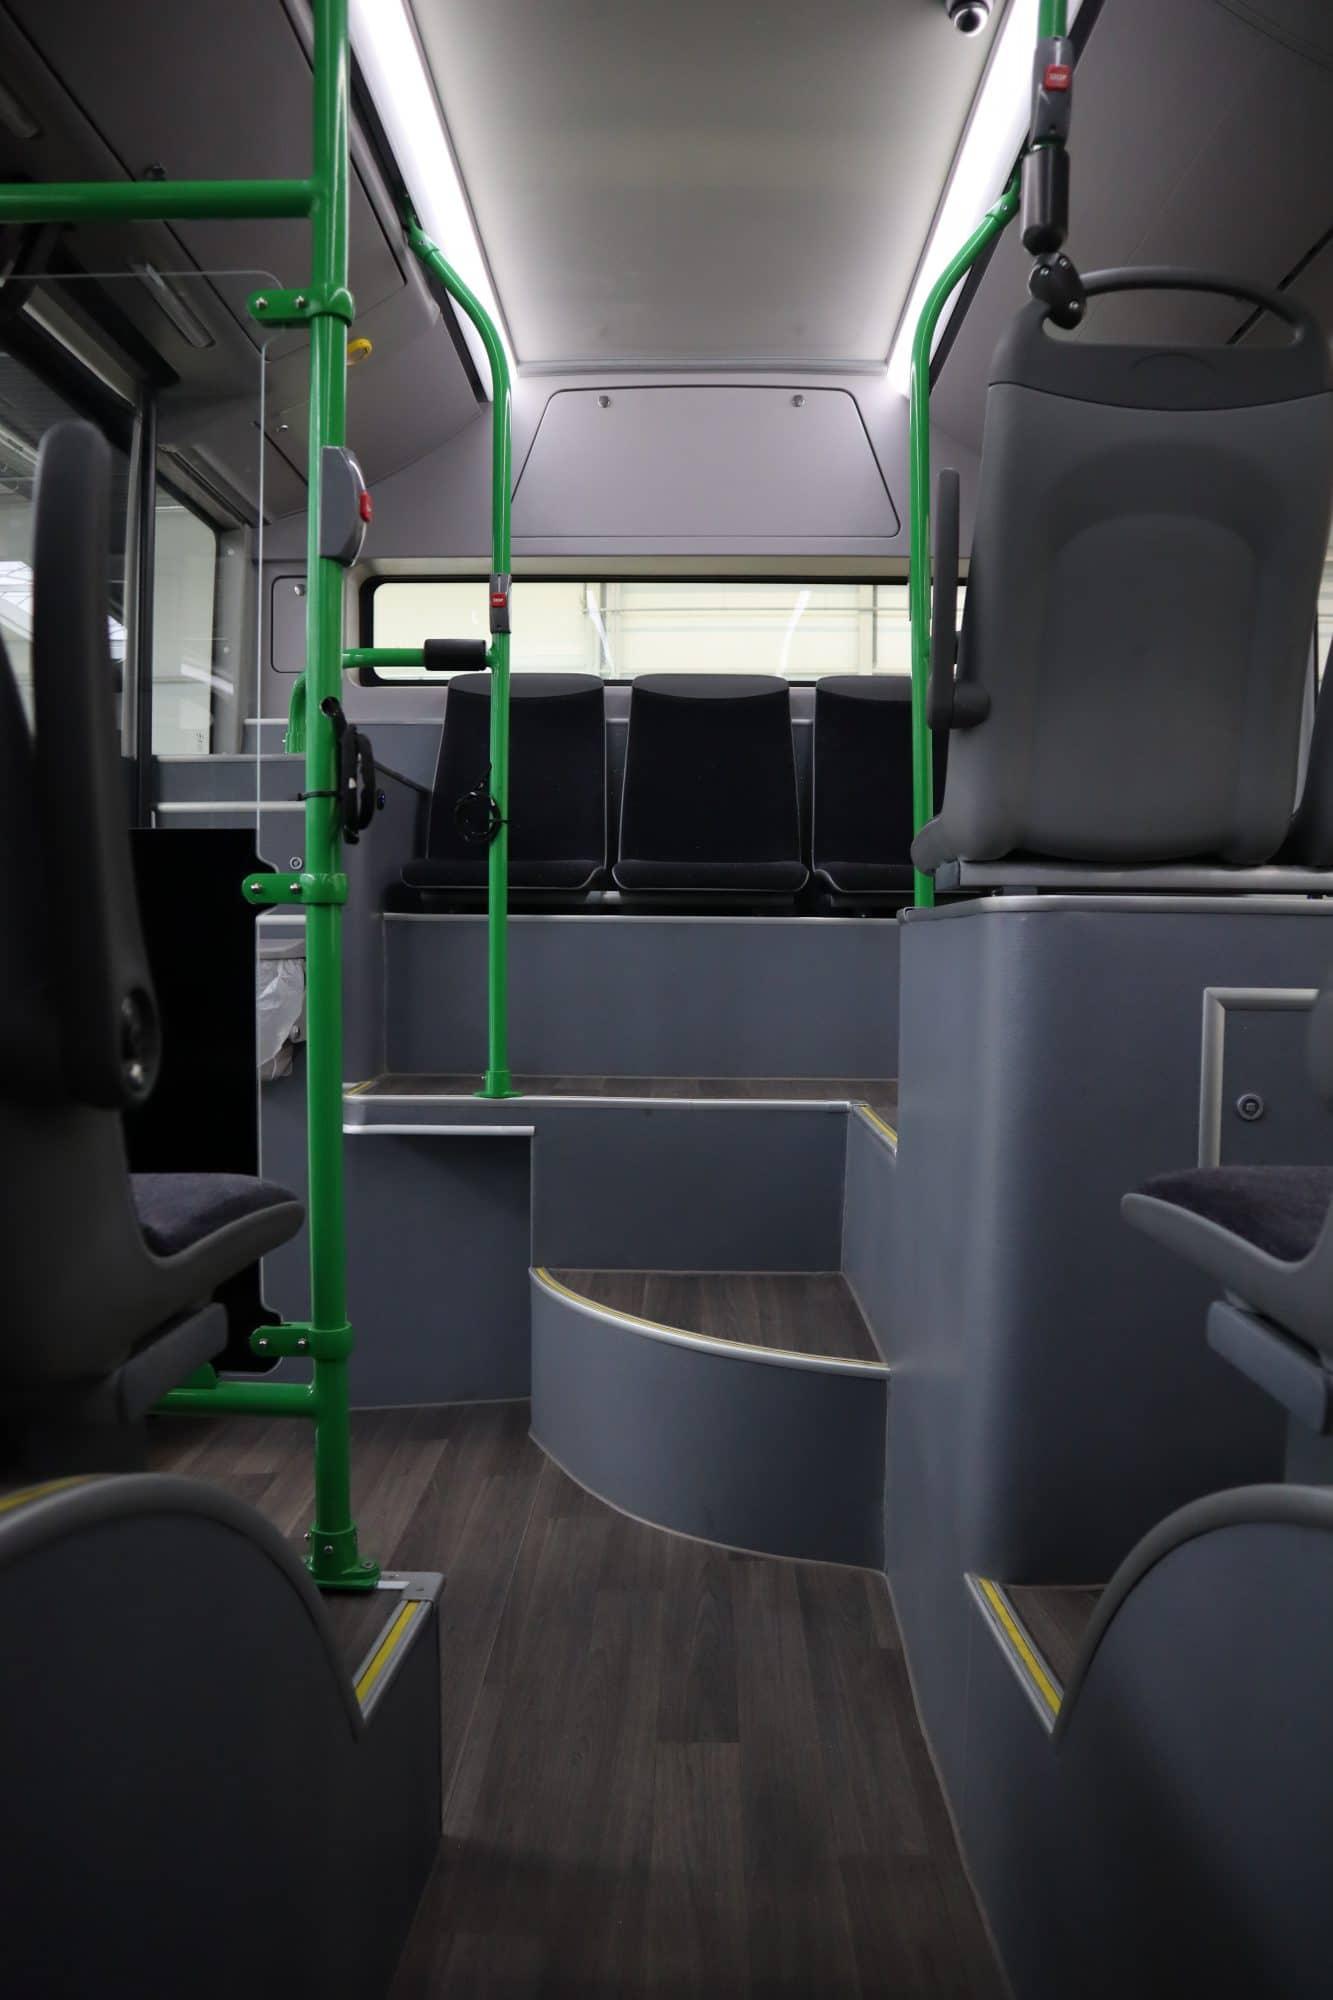 Ebusco-testbus-France